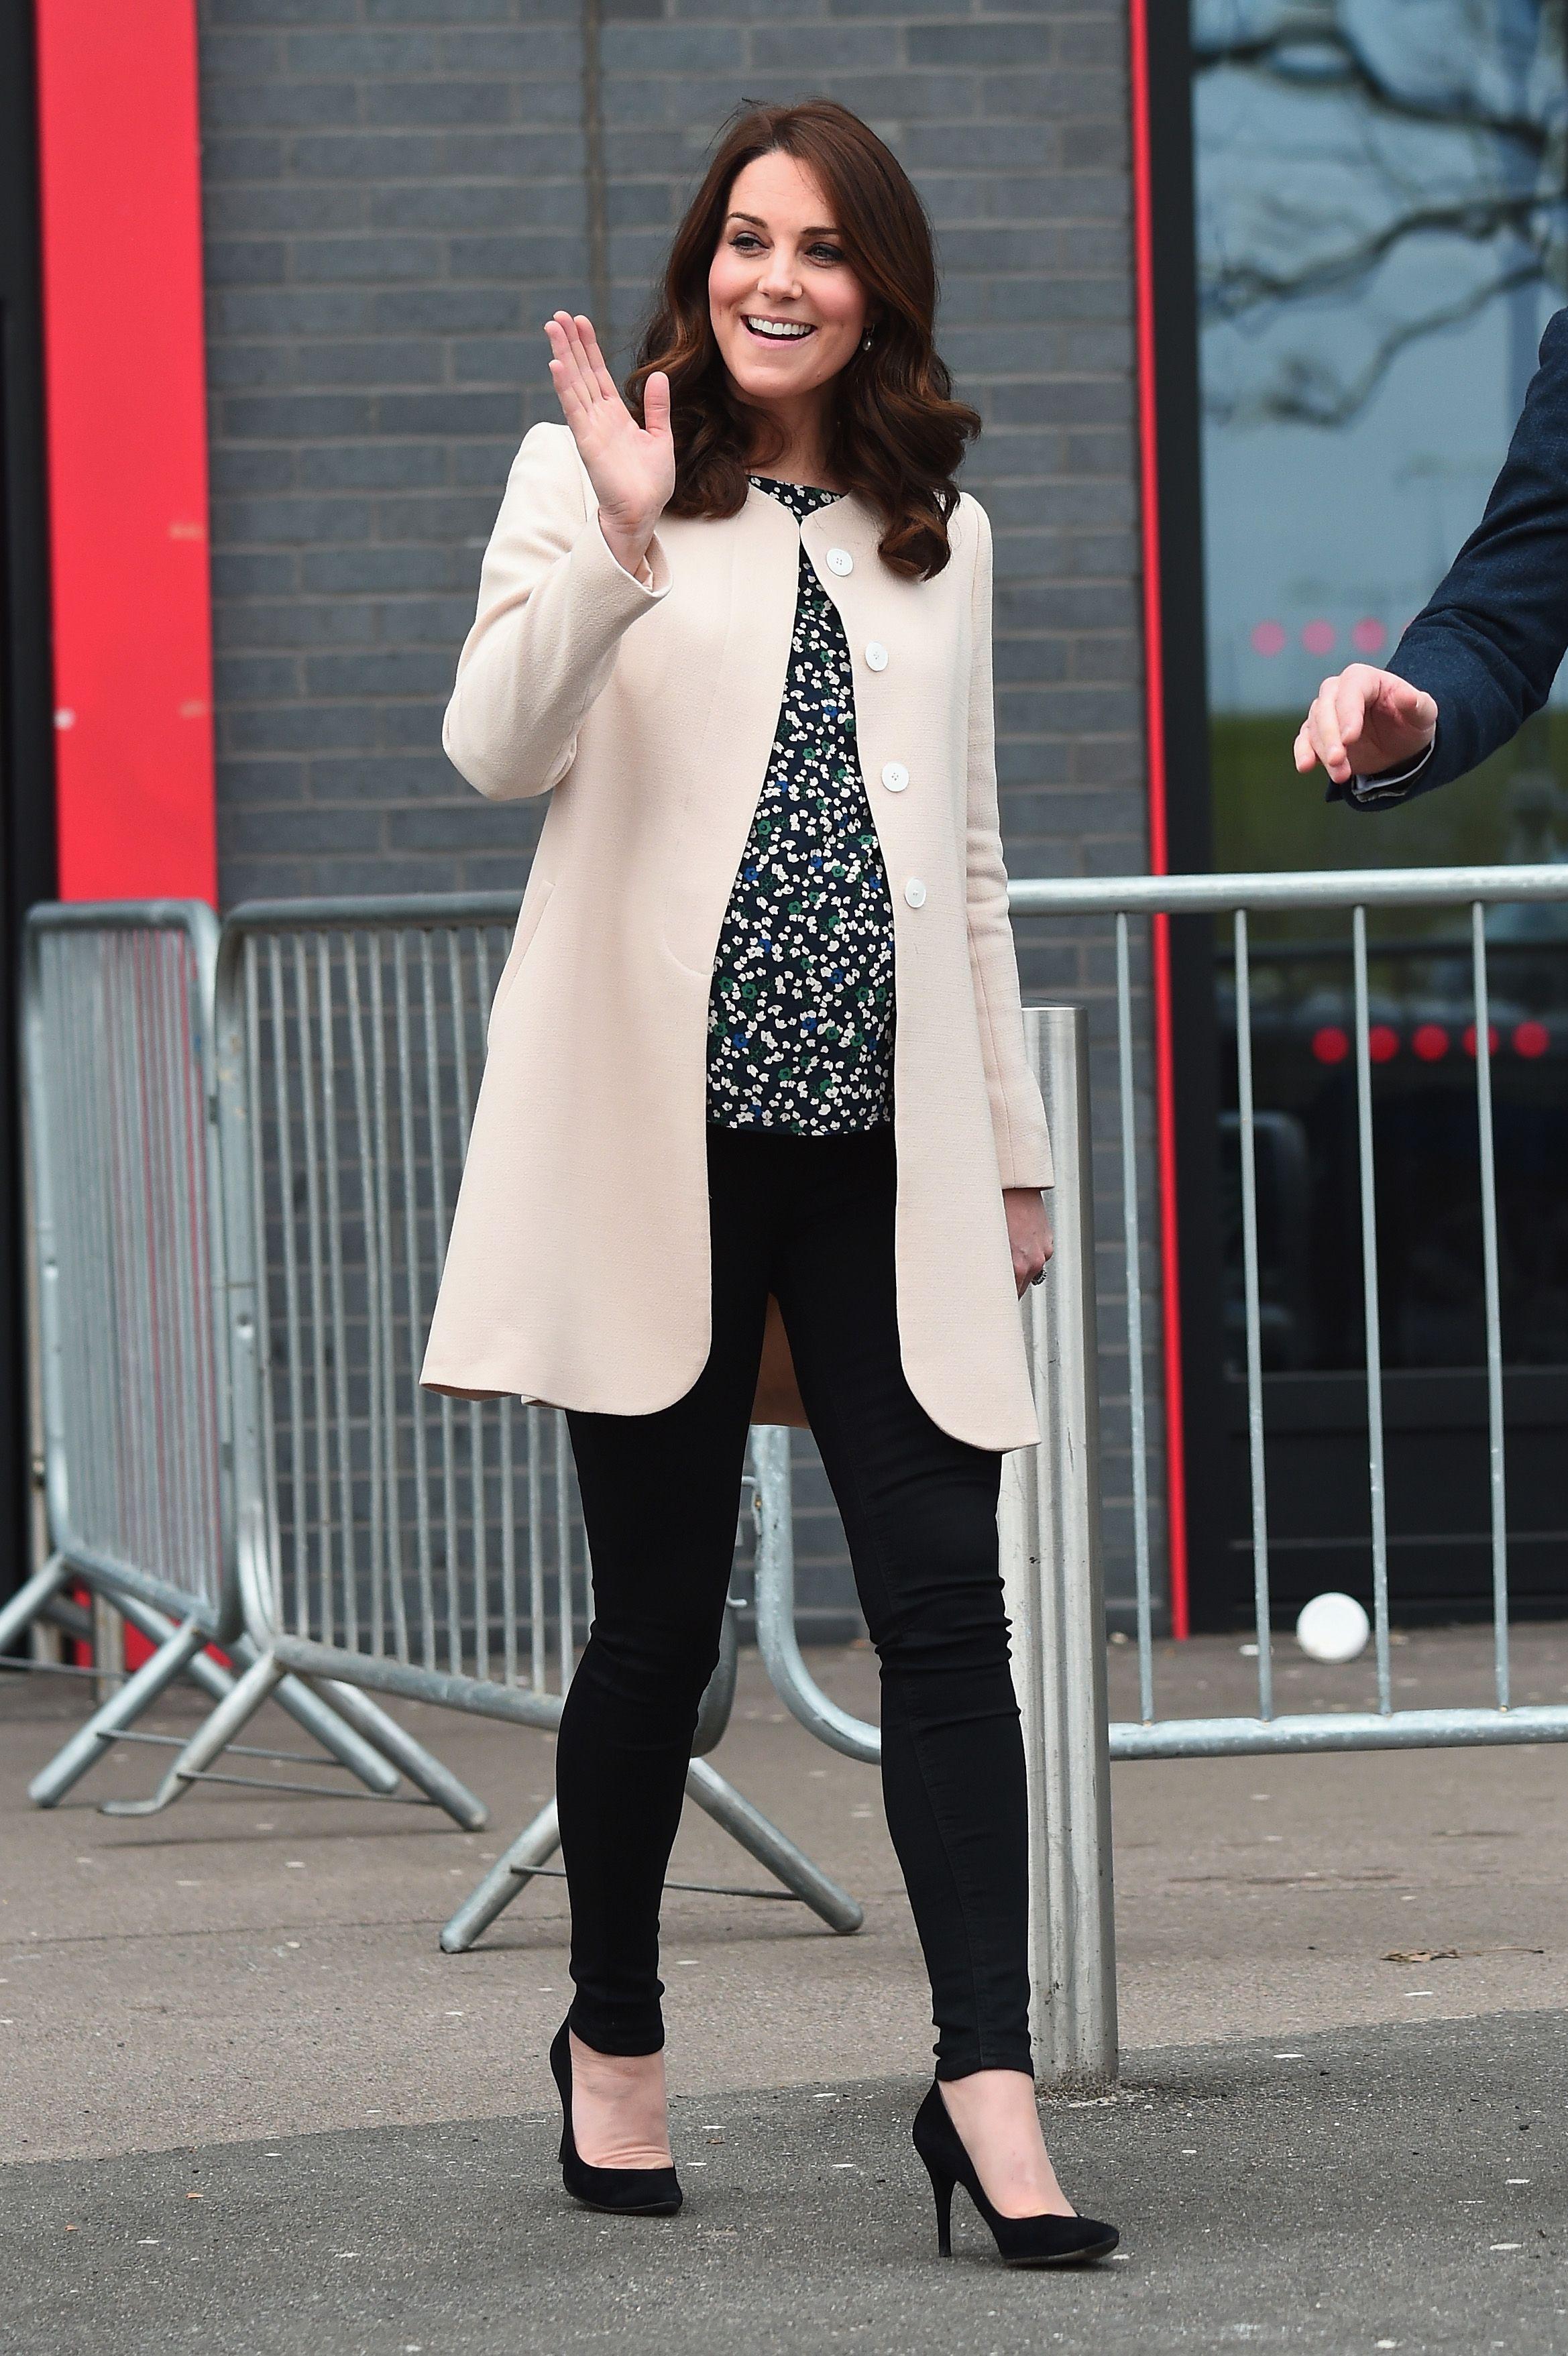 52d0bcb3705 Kate Middleton Best Fashion Moments - Kate Middleton Memorable Looks